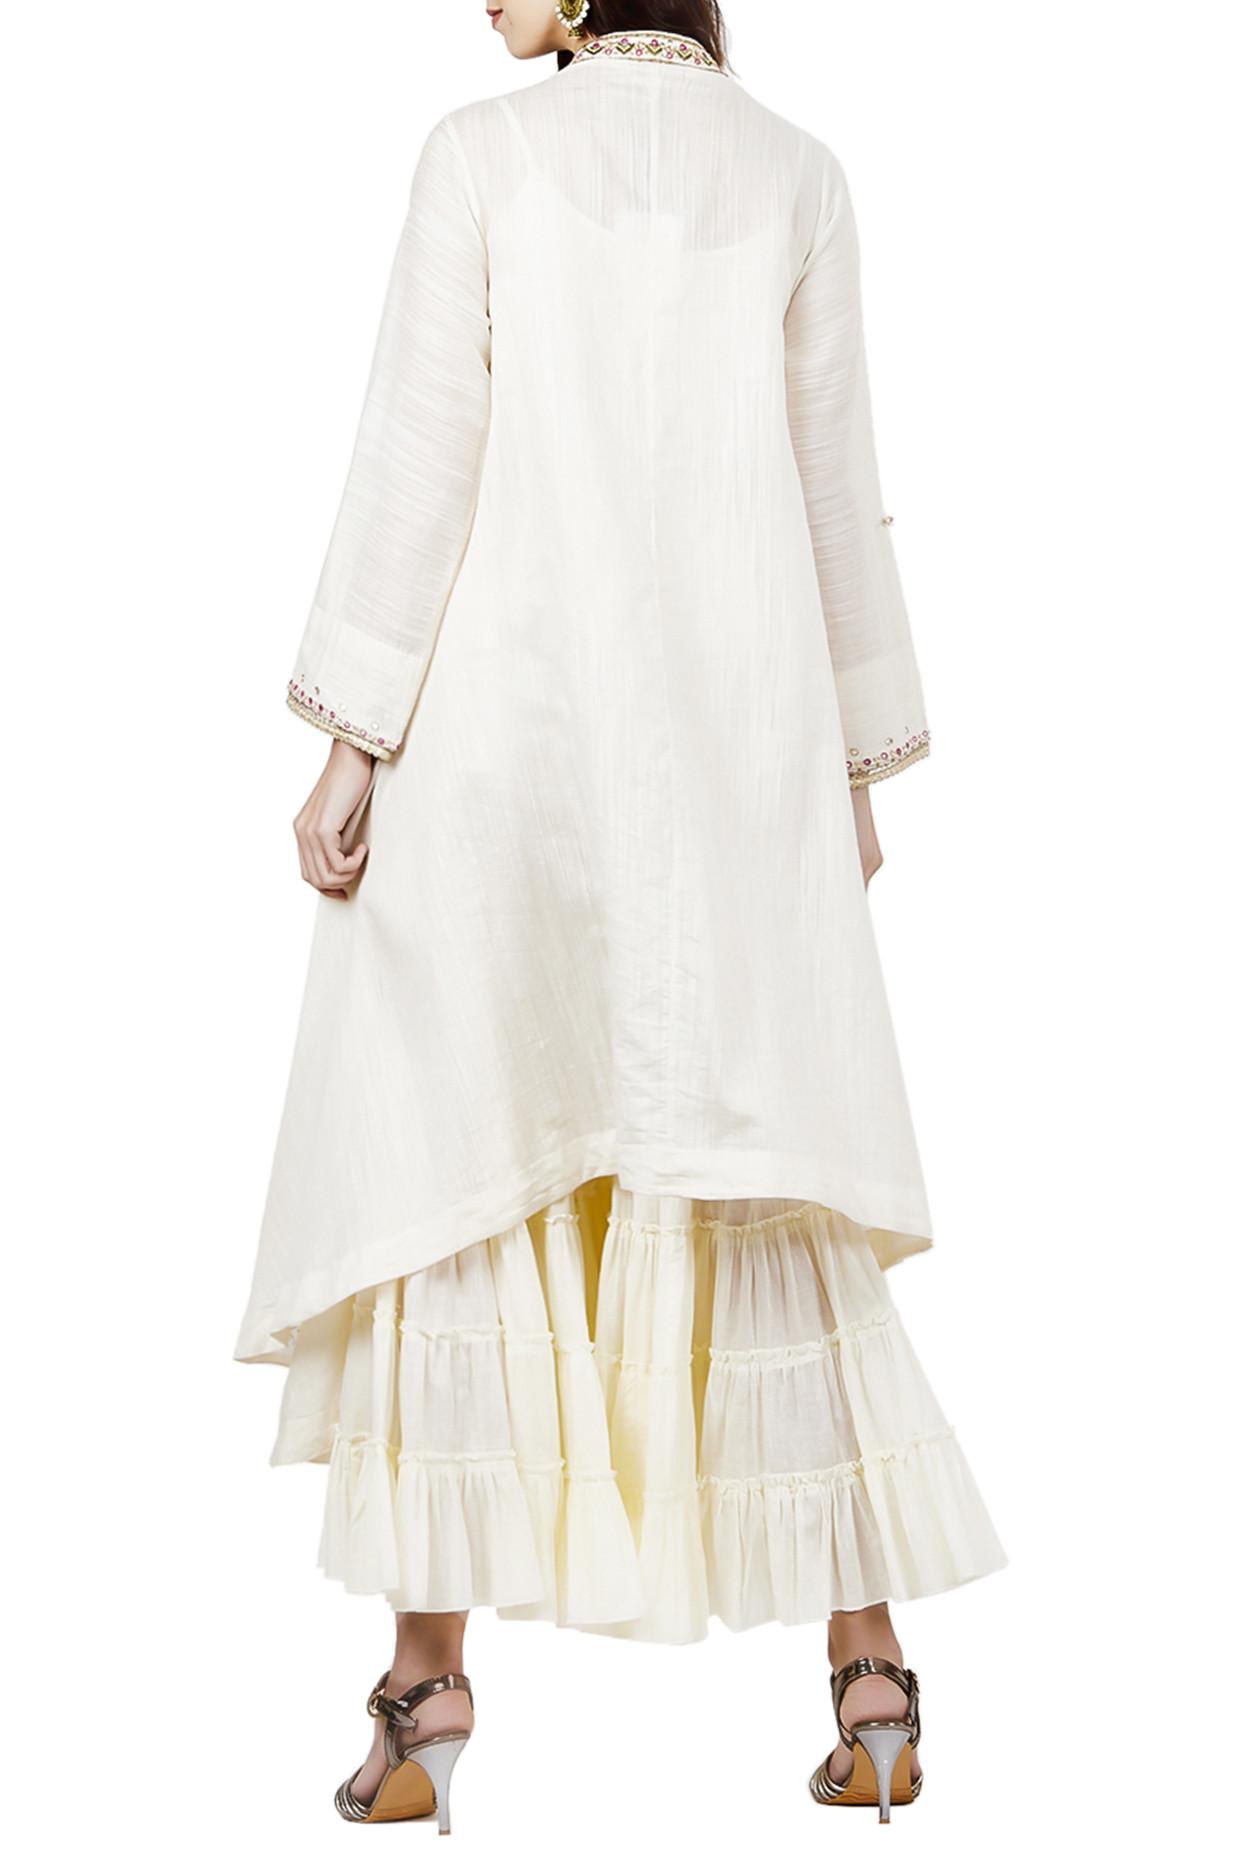 Off White Embroidered Long Kurta With Ivory Palazzo Pants by Ritu Kumar